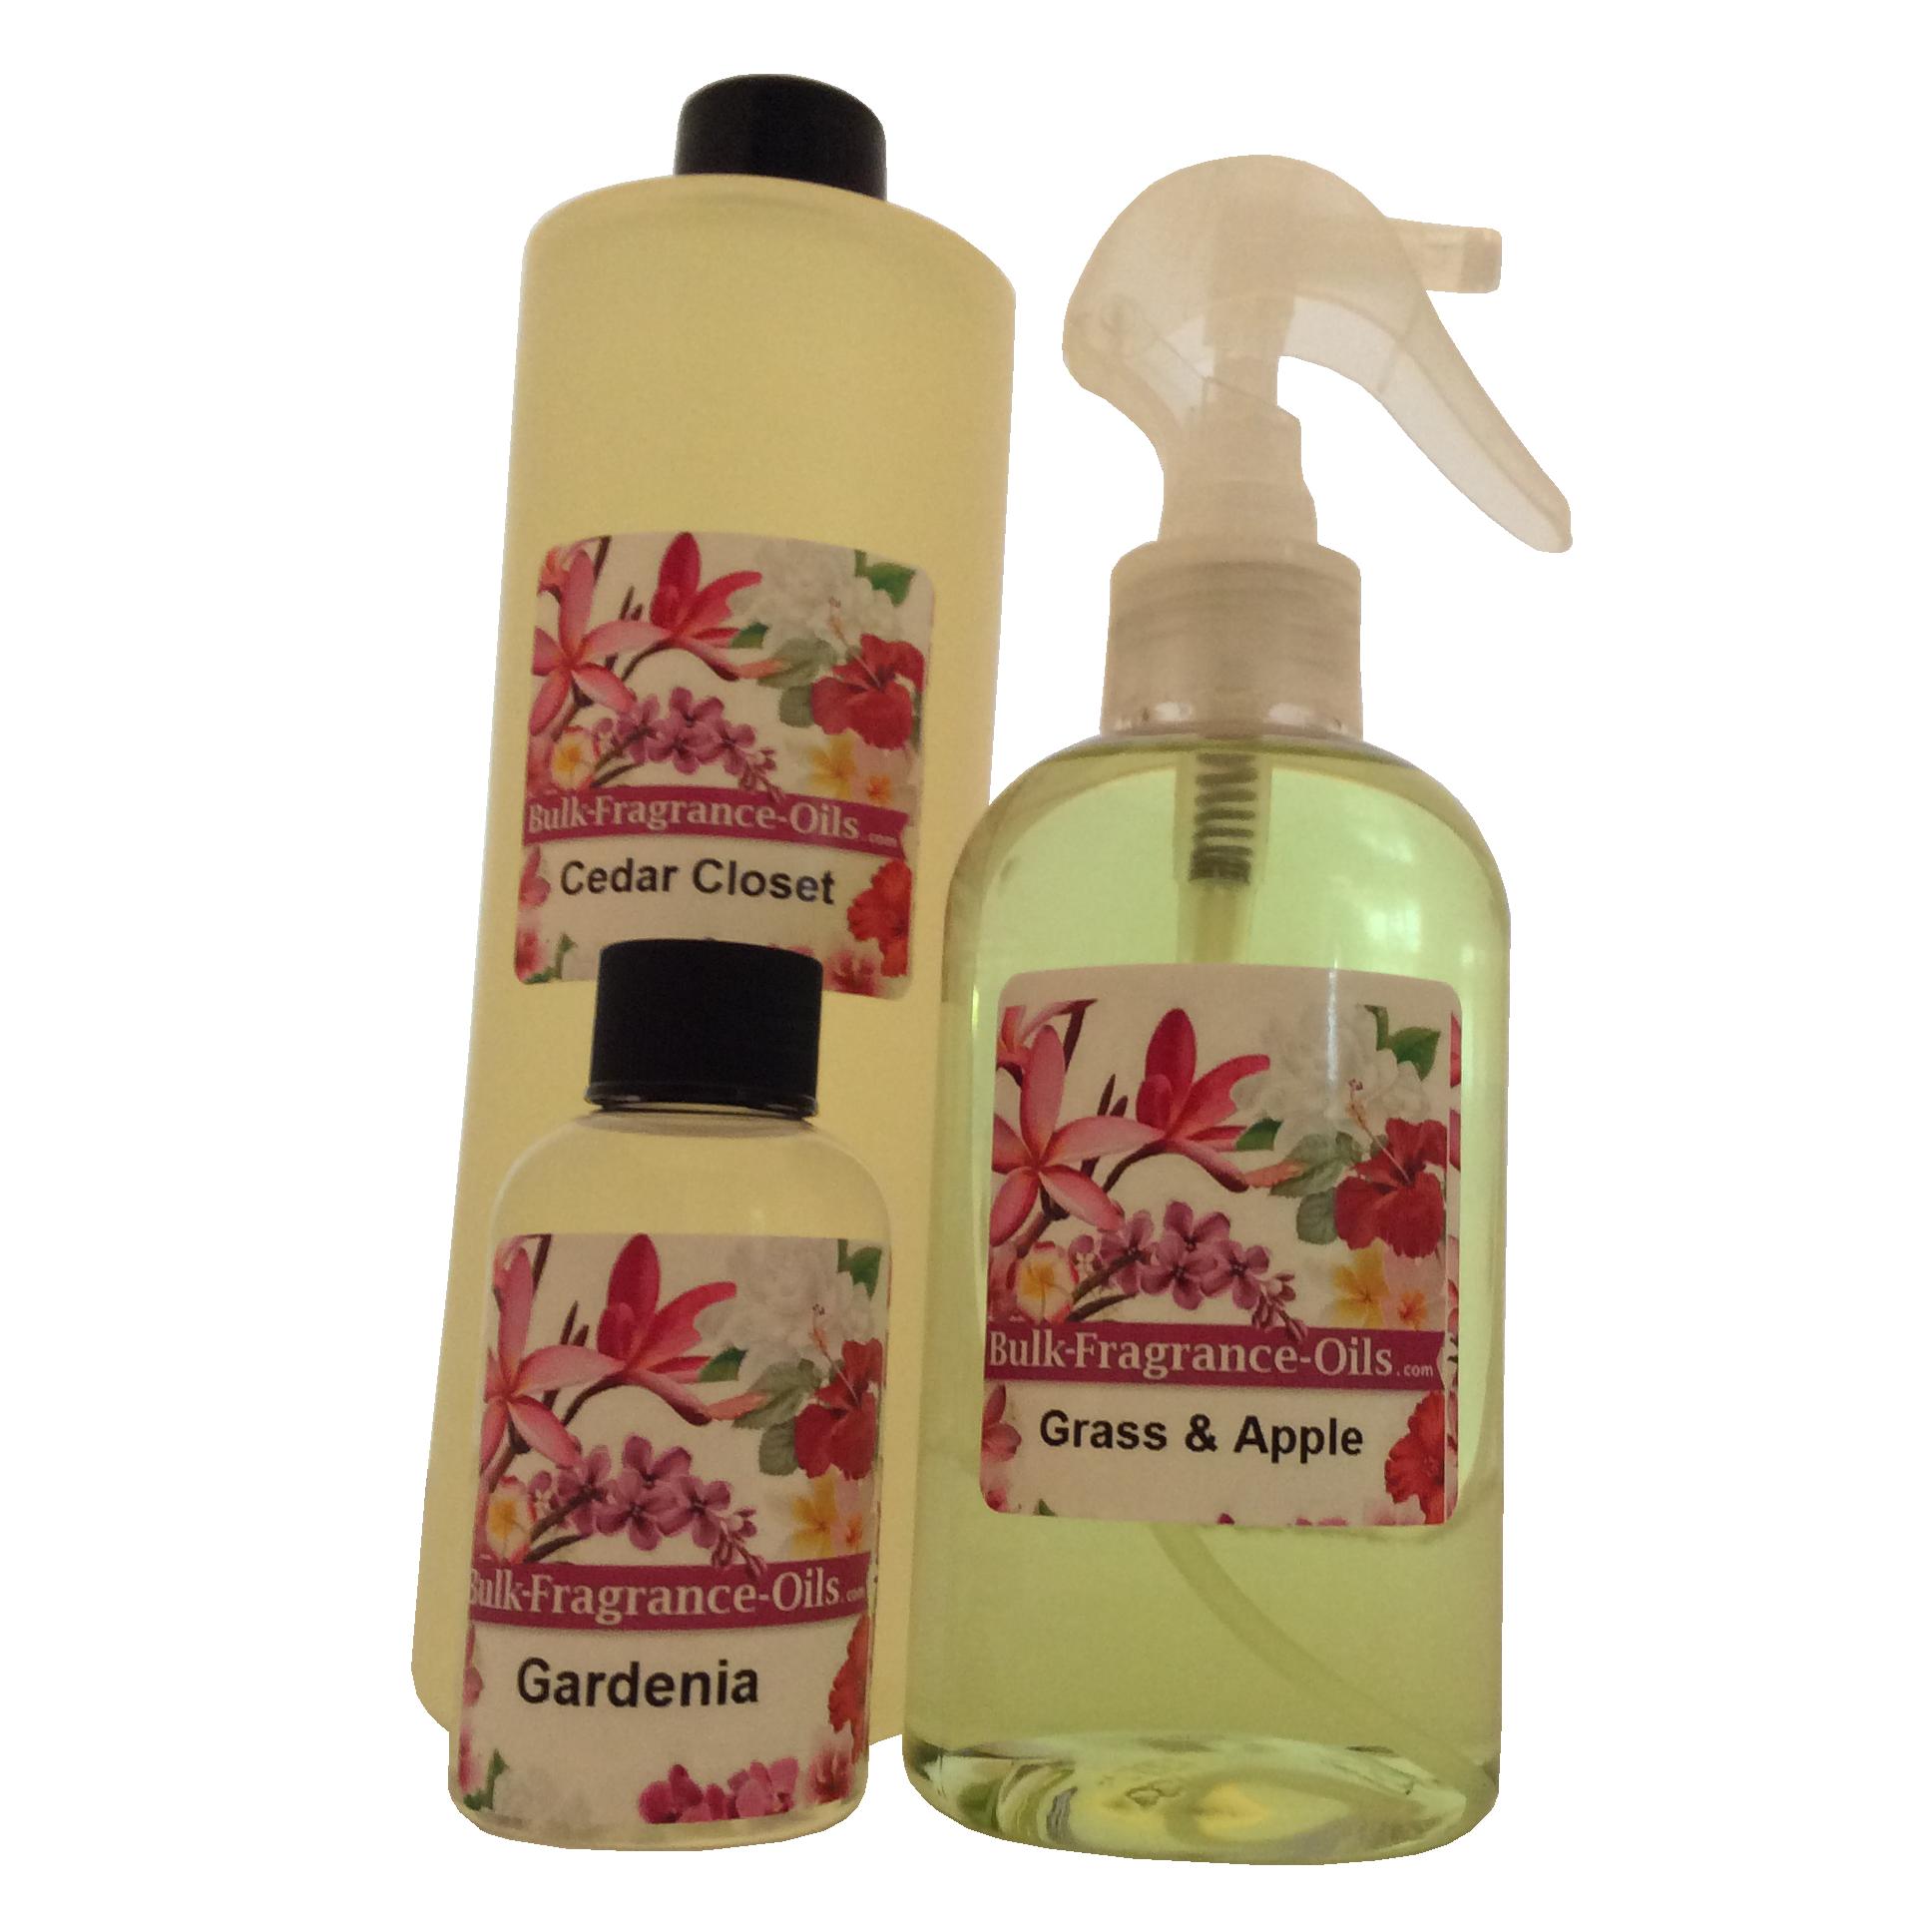 About Bulk Fragrance Oils | Wholesale Fragrance Oils